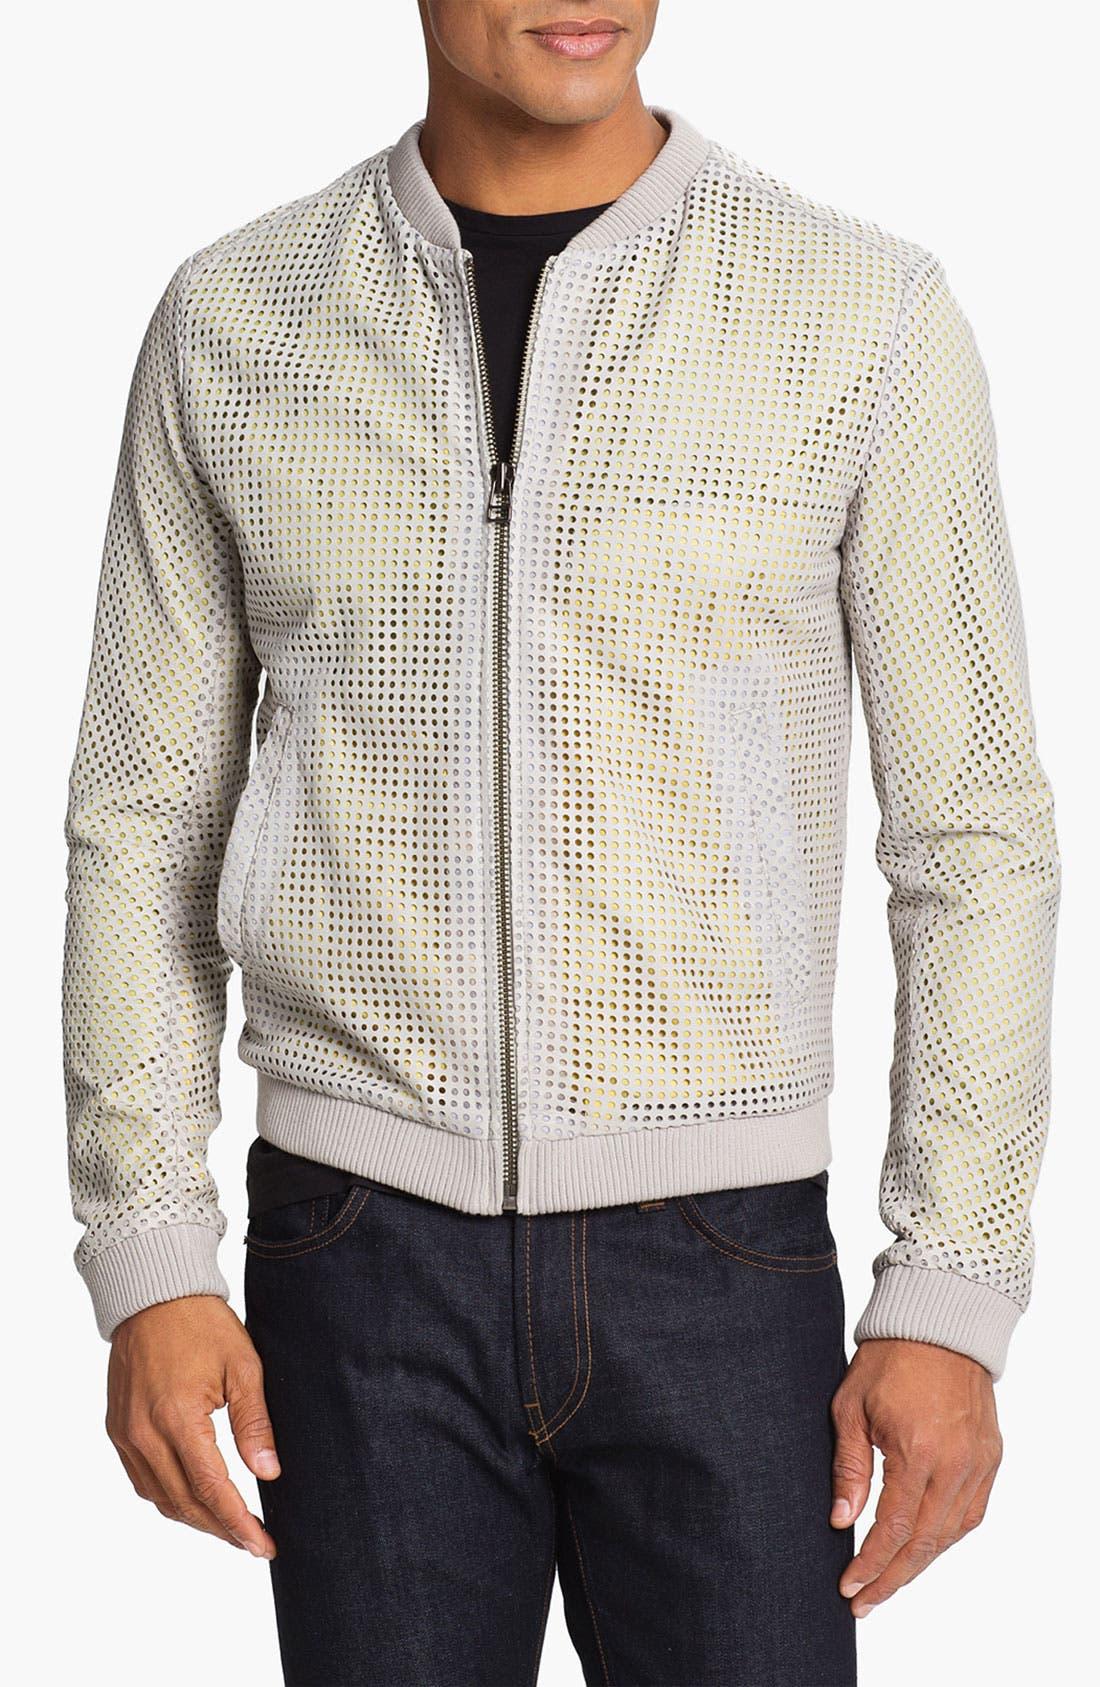 Main Image - adidas SLVR Leather Jacket